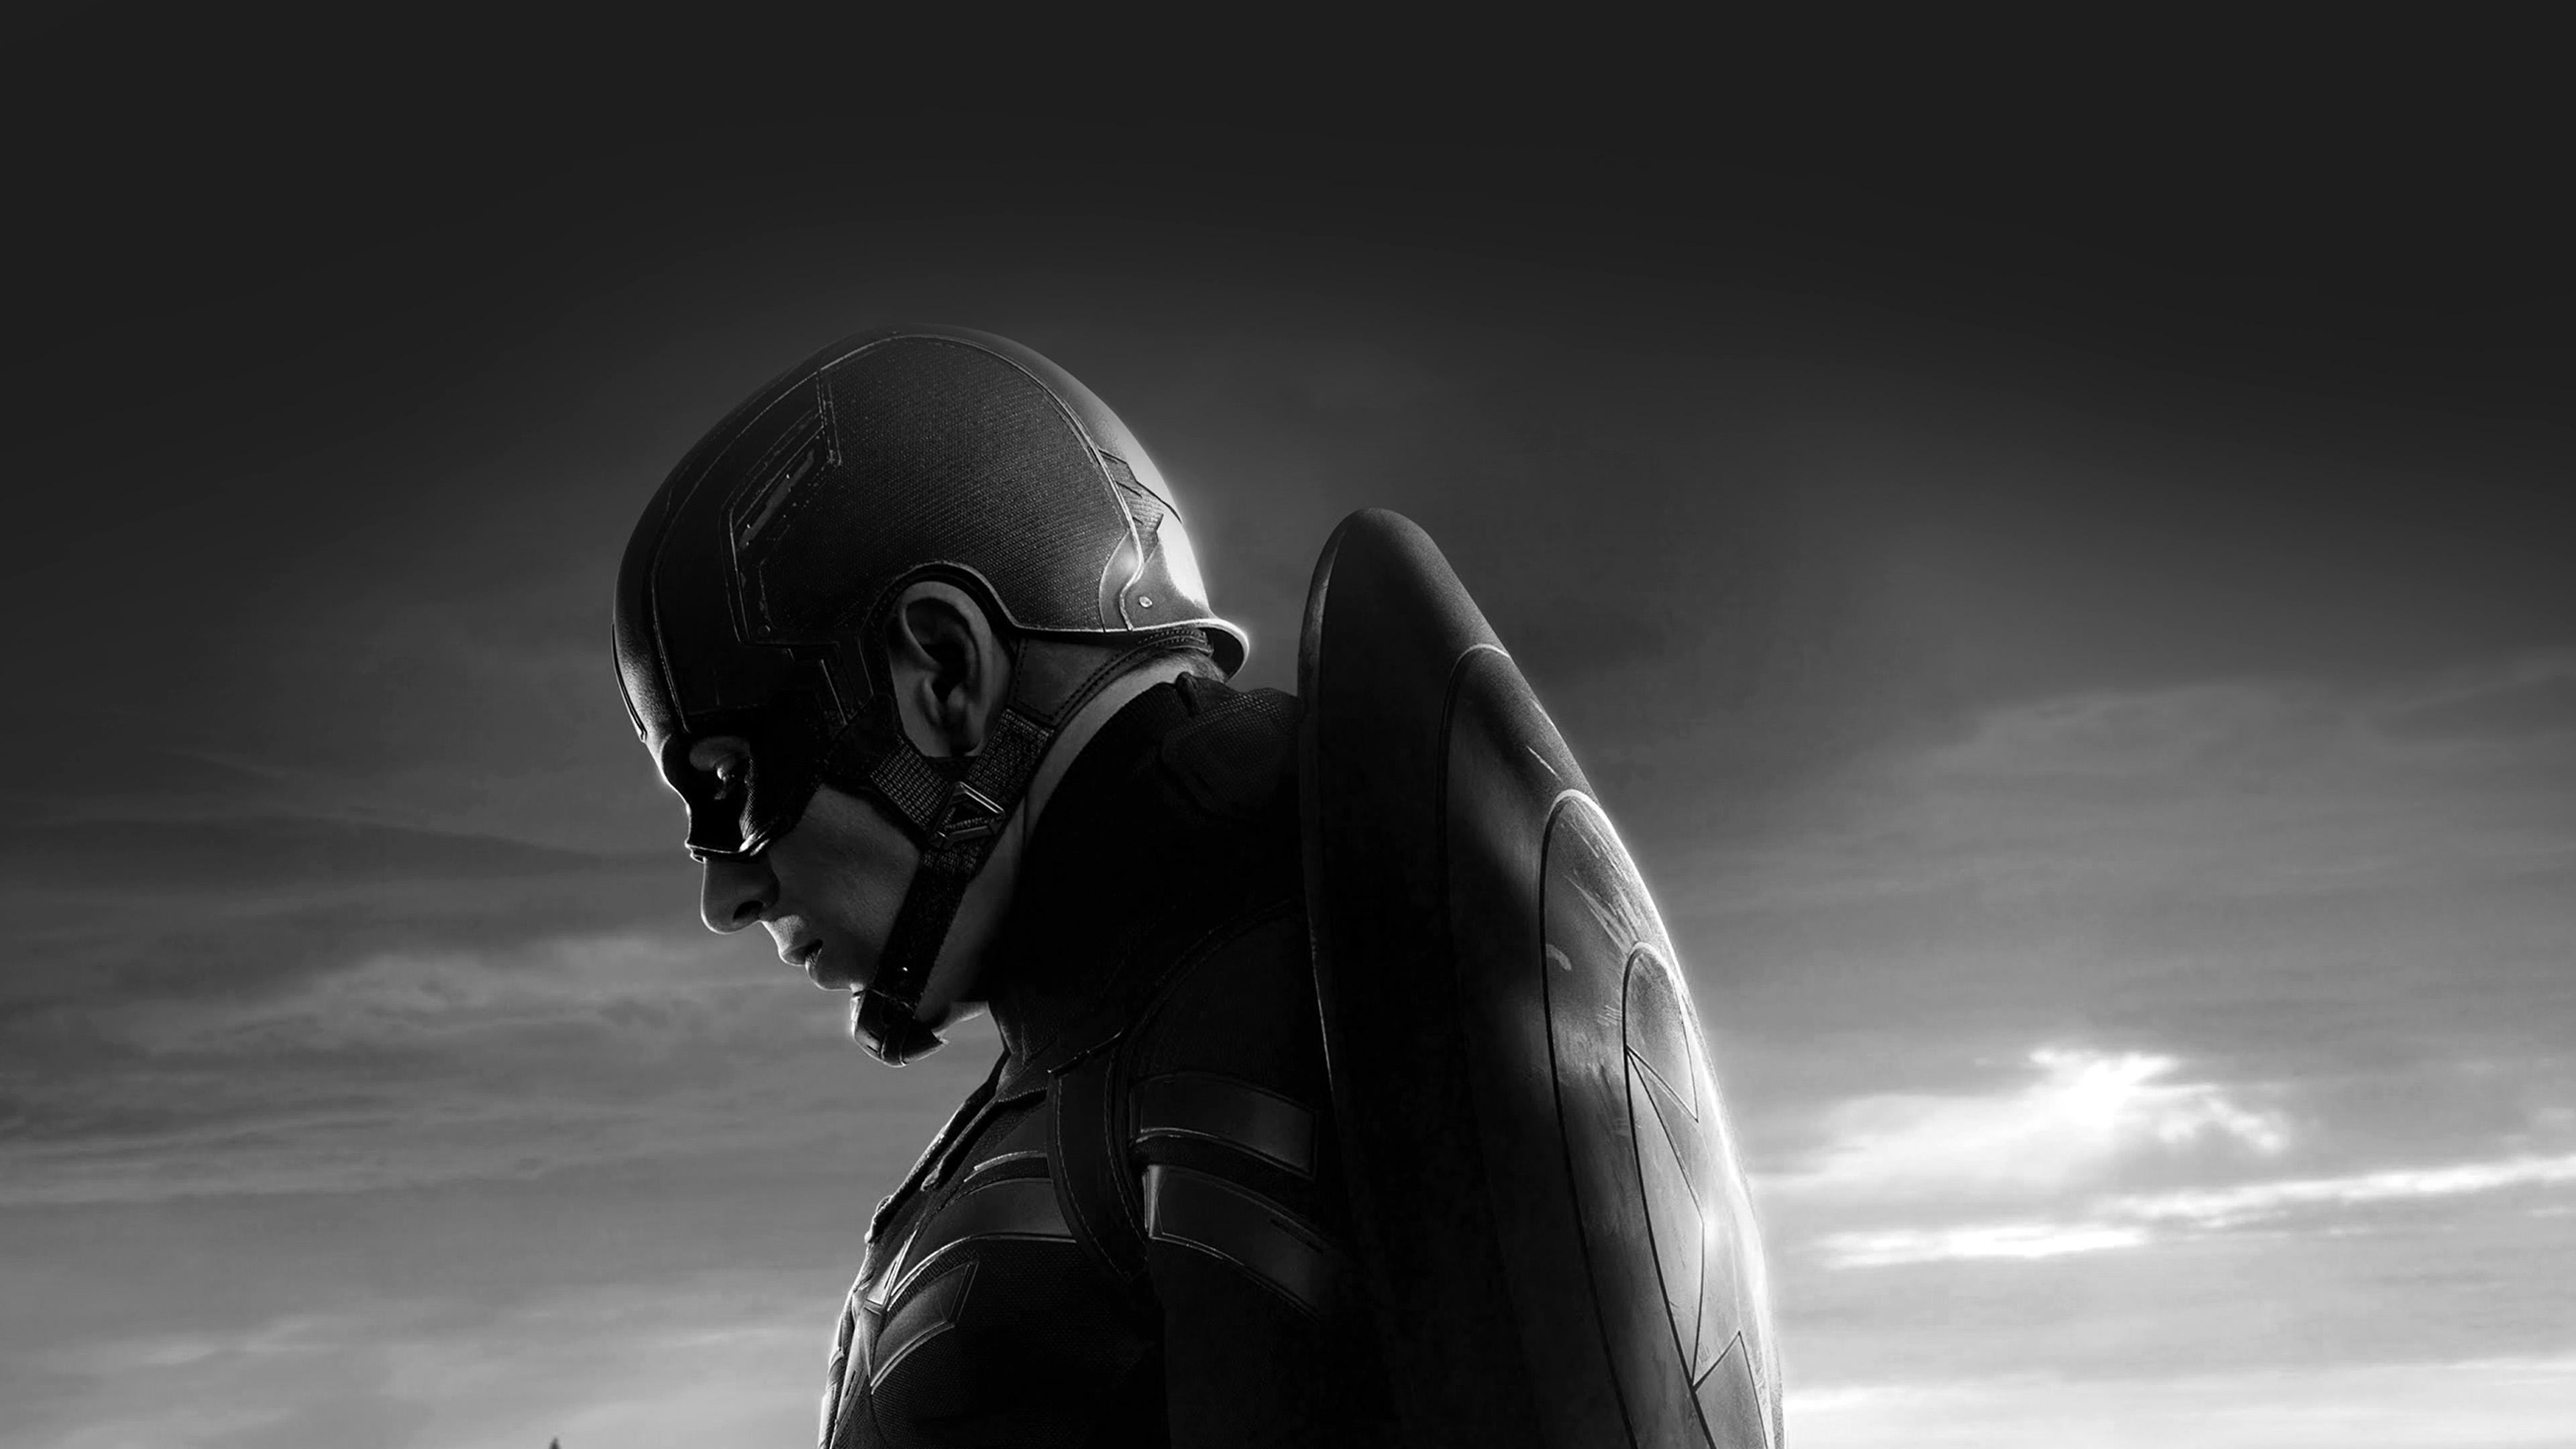 An85-captain-america-sad-hero-film-marvel-dark-bw-wallpaper